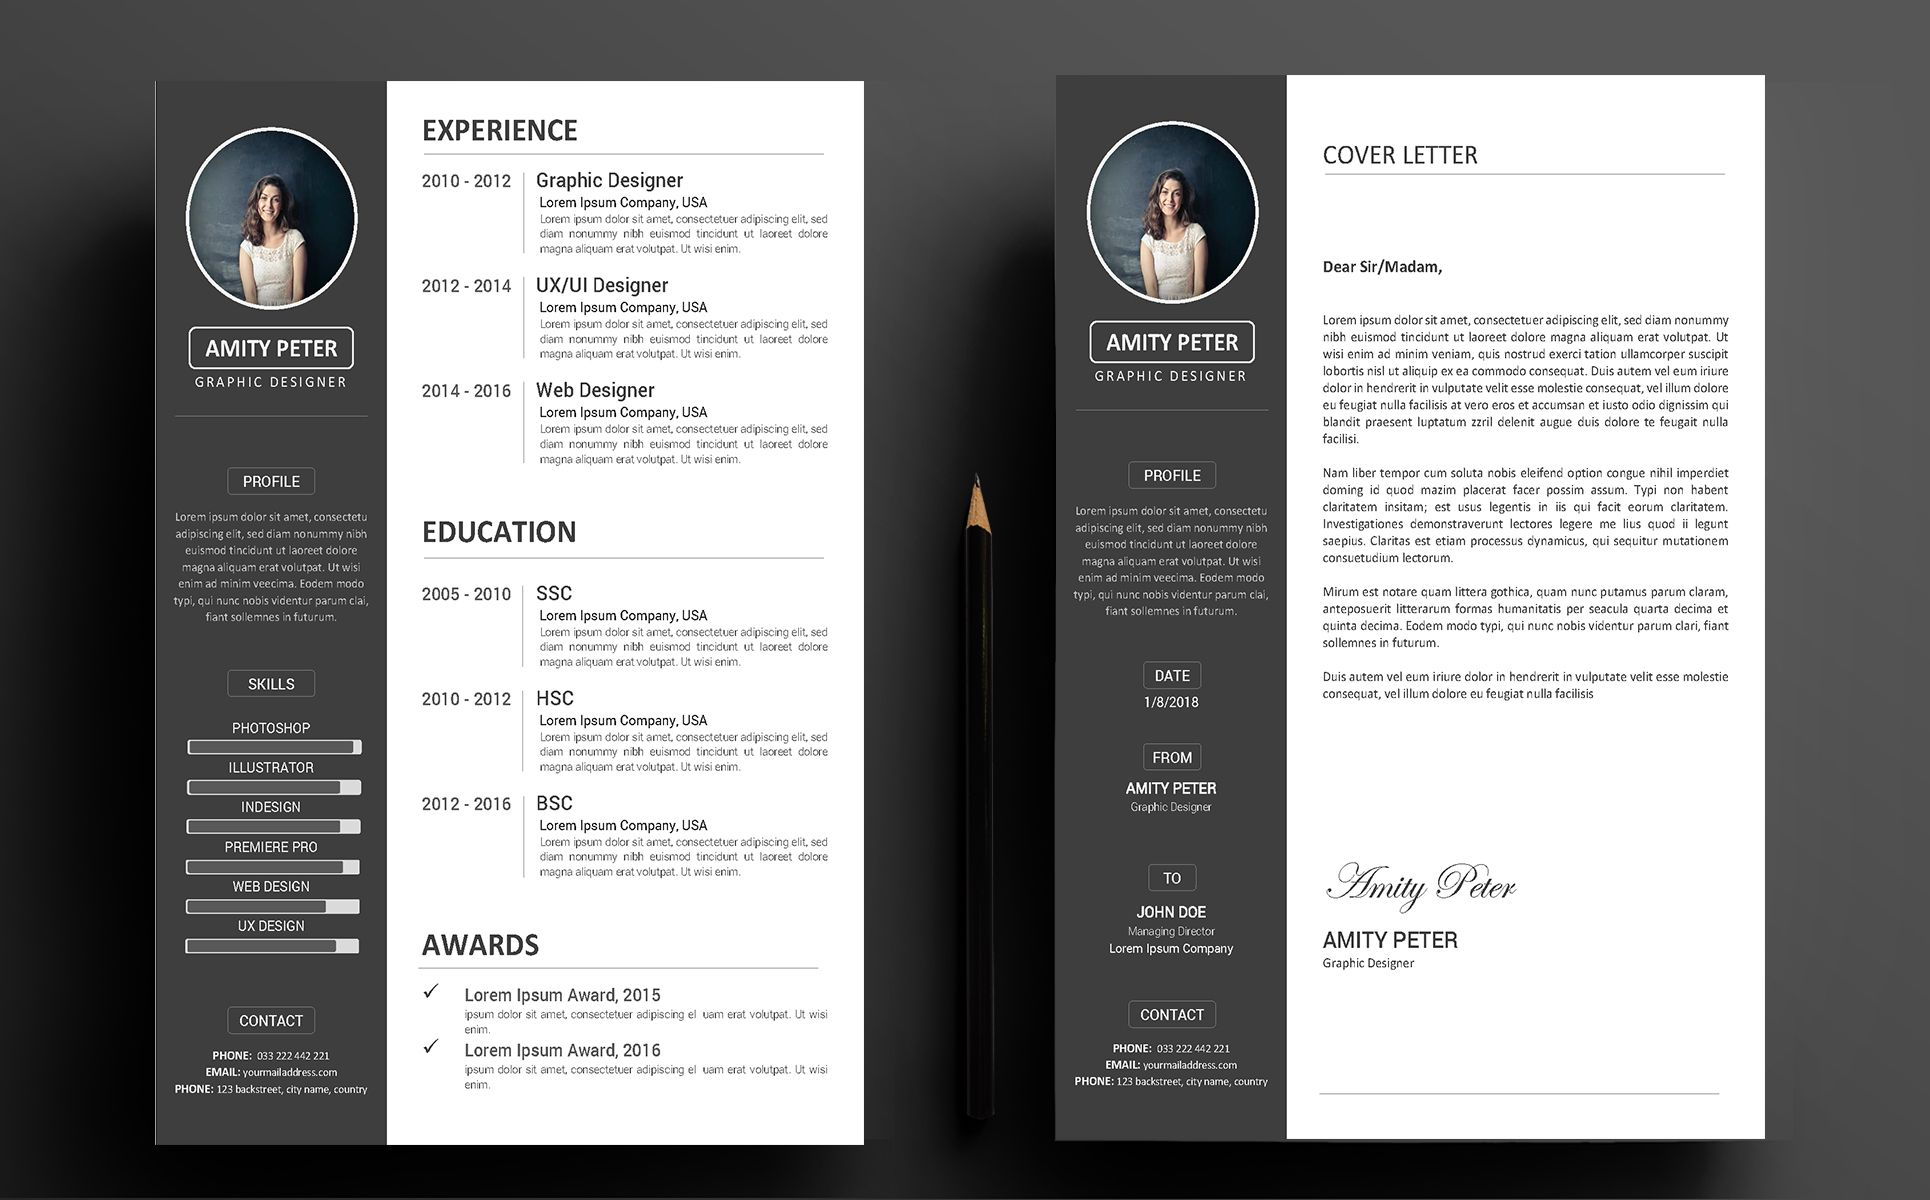 Amity Peter Cv Resume Template 71495 Templatemonster Cv Resume Template Resume Template Resume